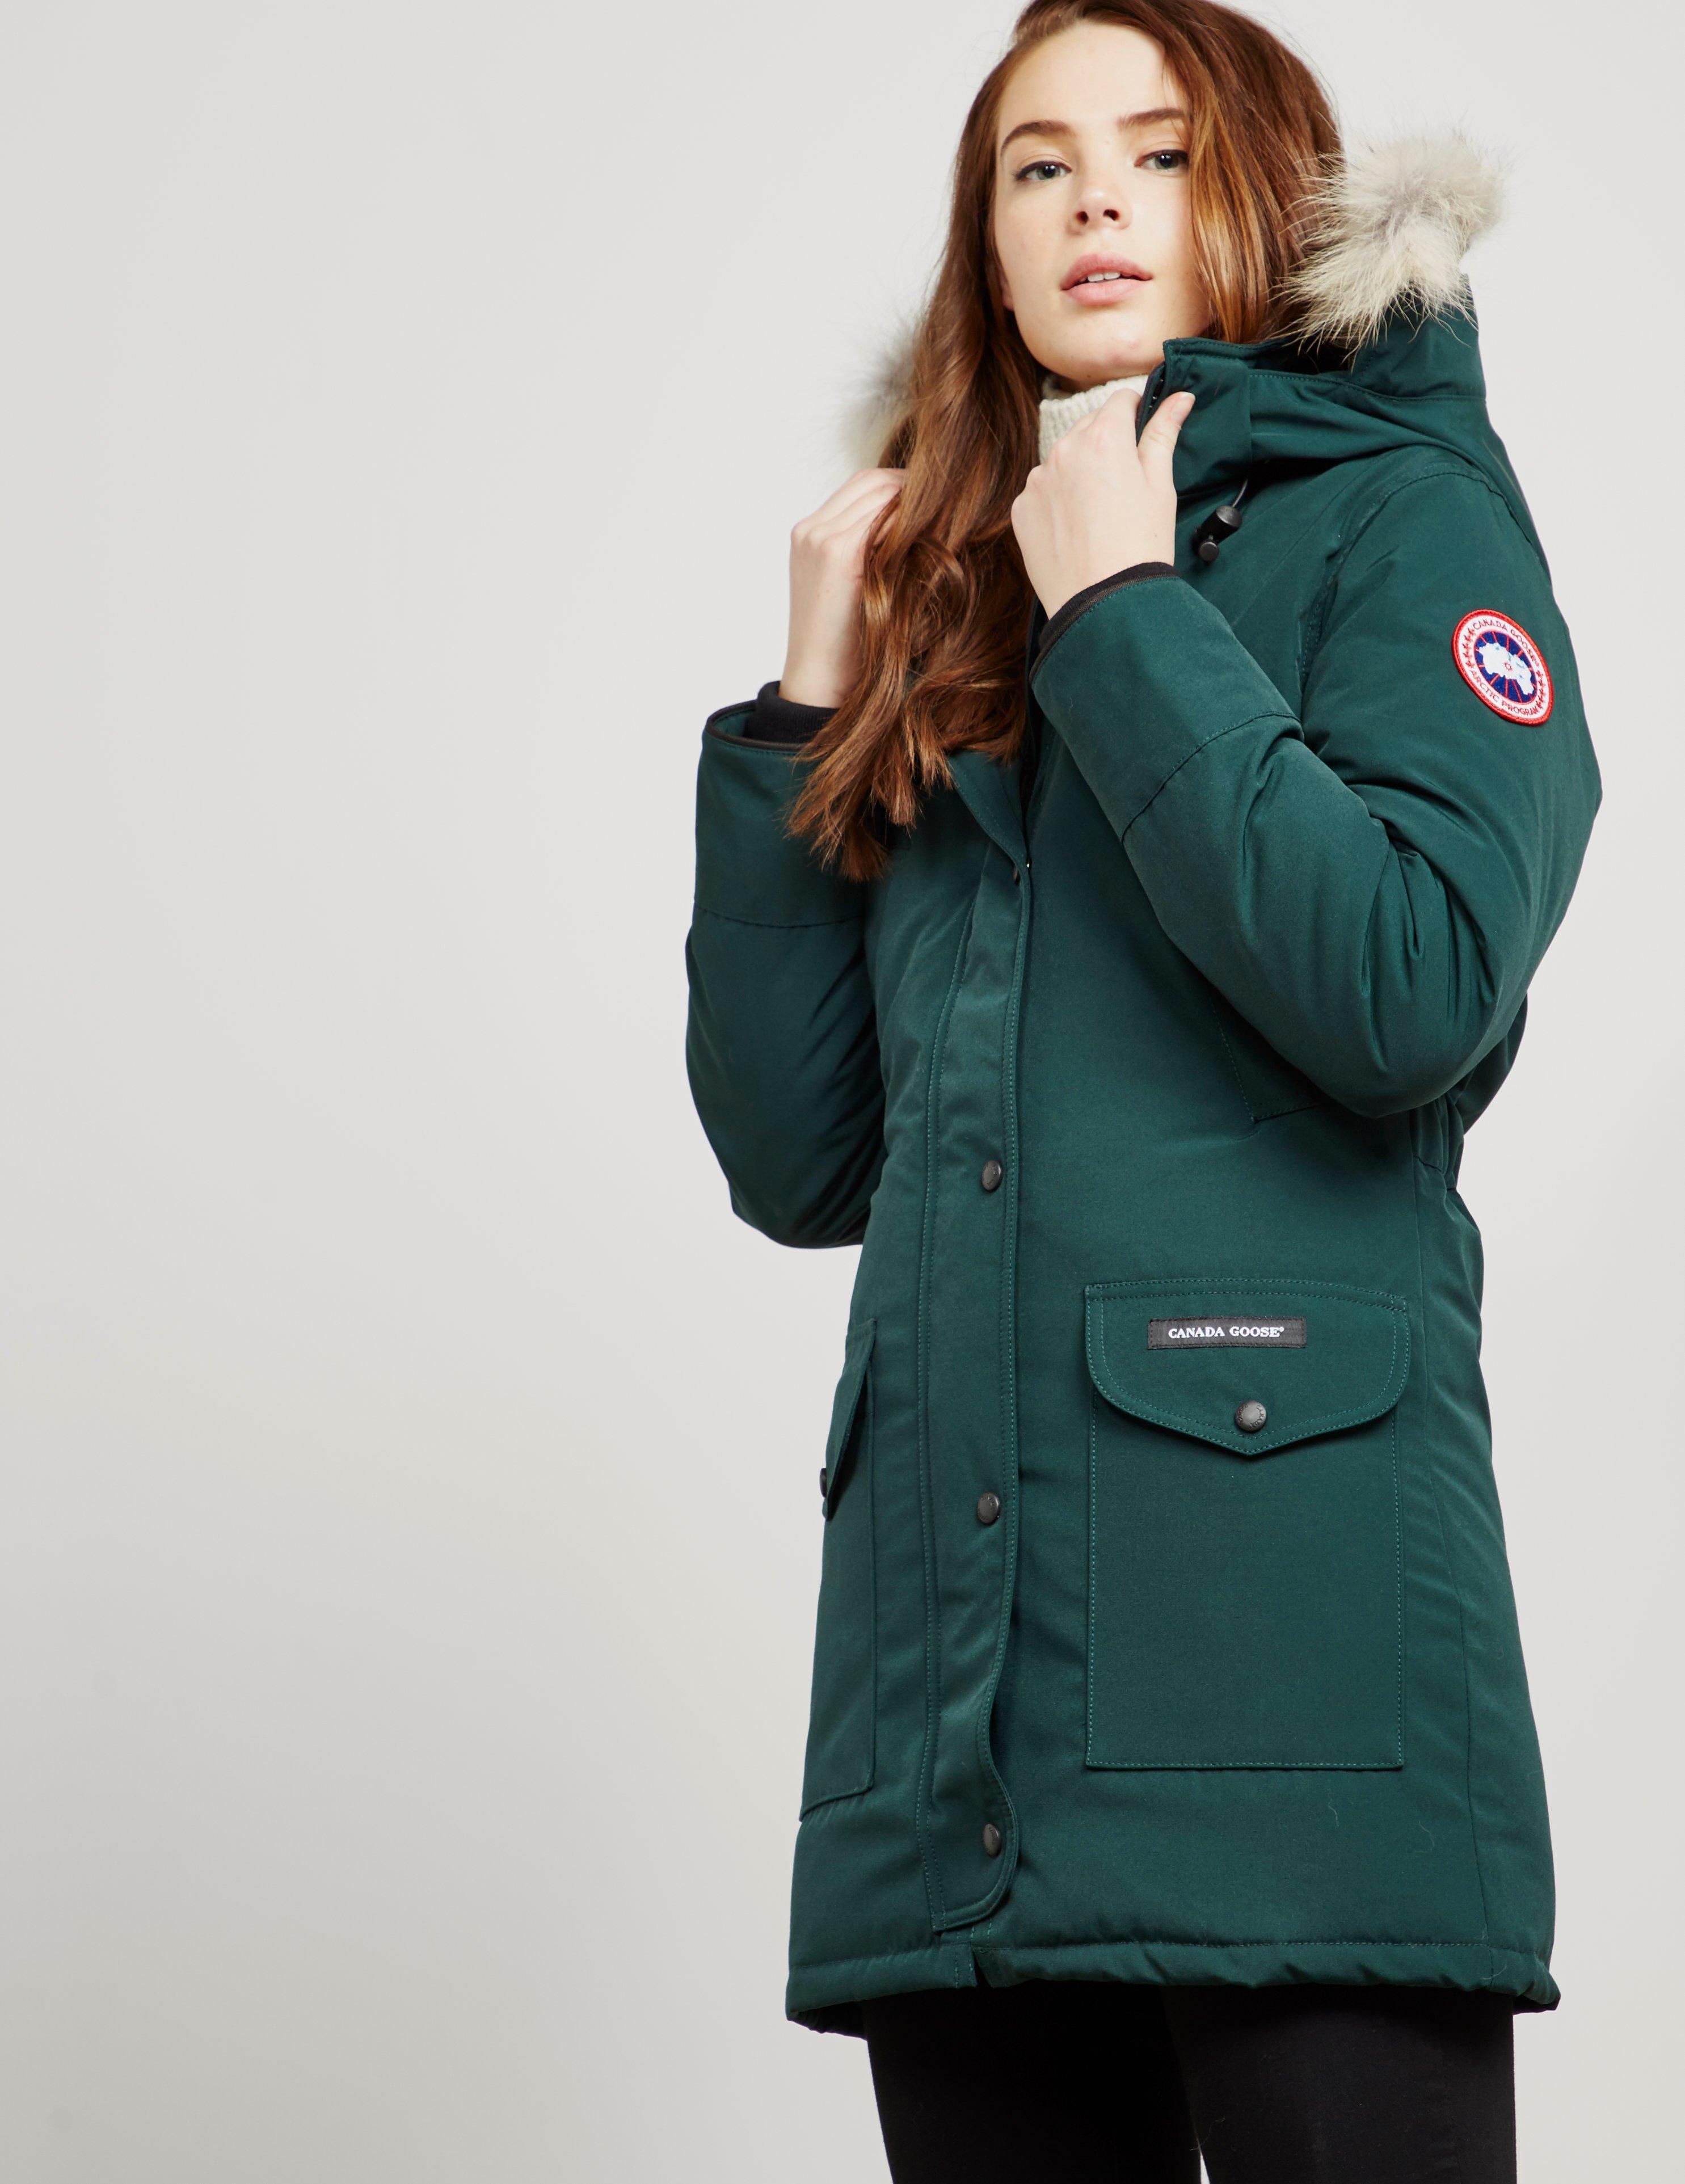 b2e38e5c4a0 ... order canada goose womens trillium padded parka jacket green lyst. view  fullscreen 4d5a6 4a2ce